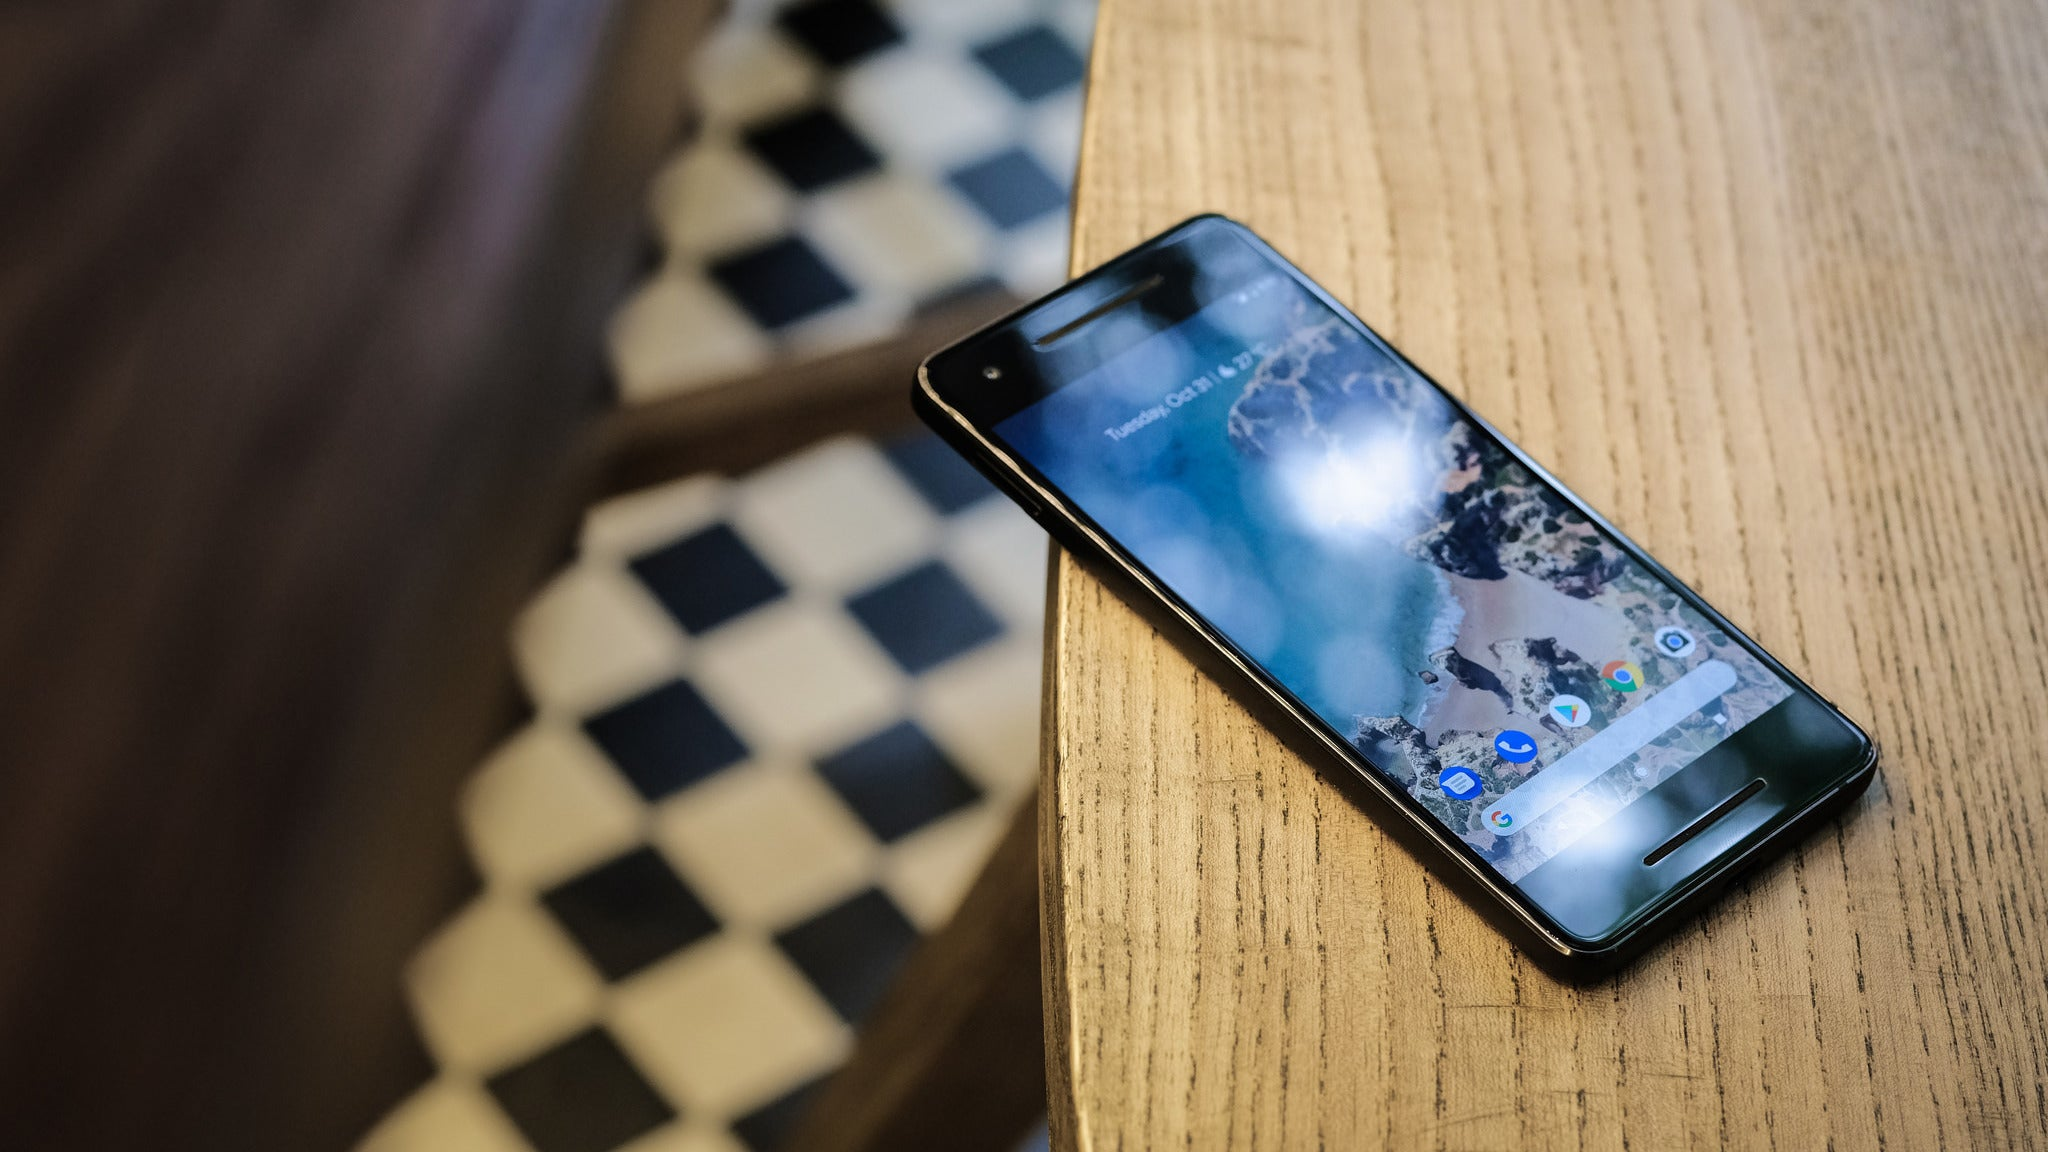 Swap Your Pixel 2's Google Assistant For Cortana